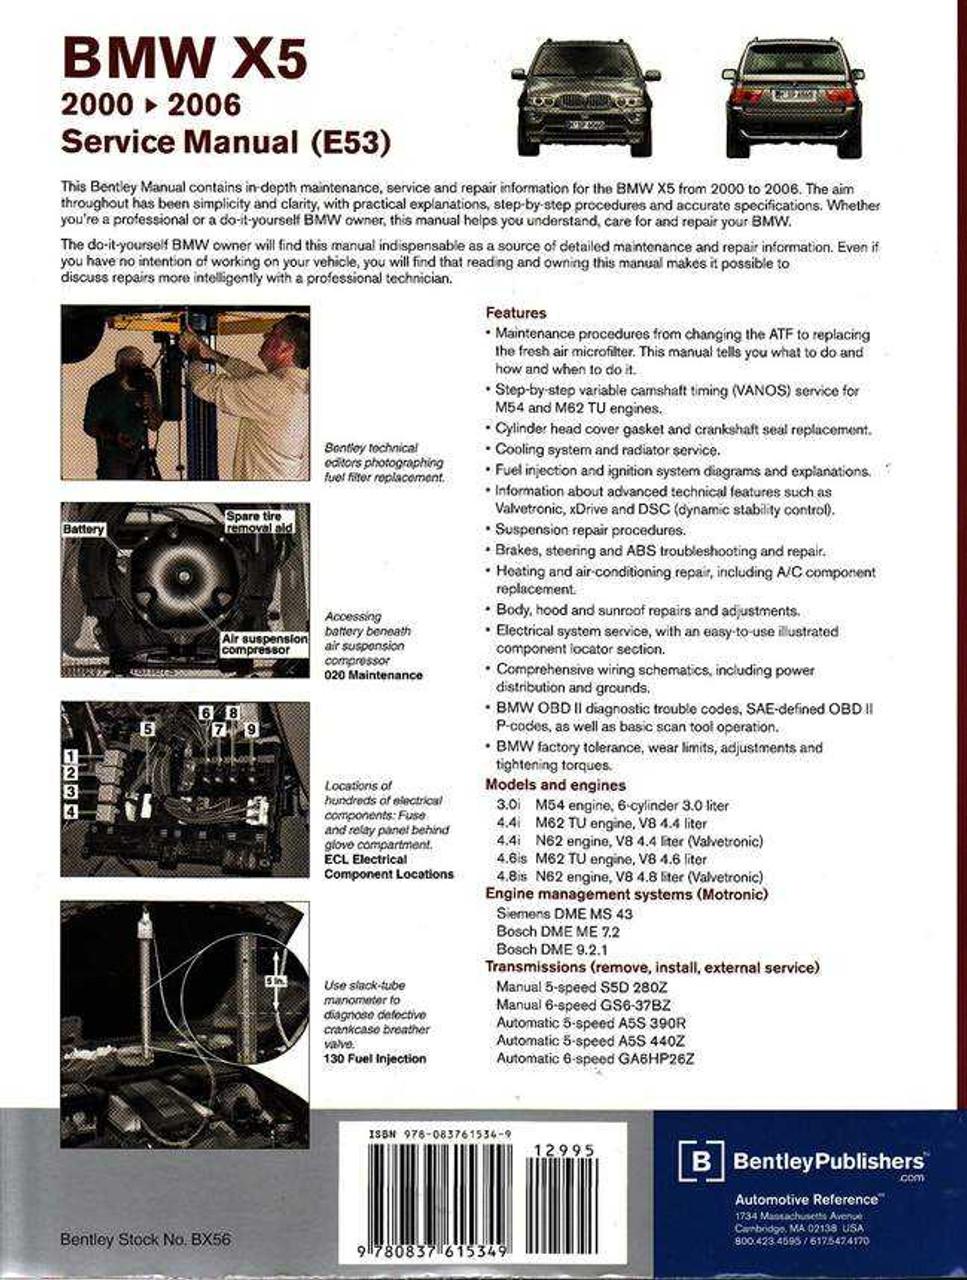 bmw x5 e53 2000 2006 workshop manual rh automotobookshop com au 2014 X5 BMW bentley bmw x5 service manual download